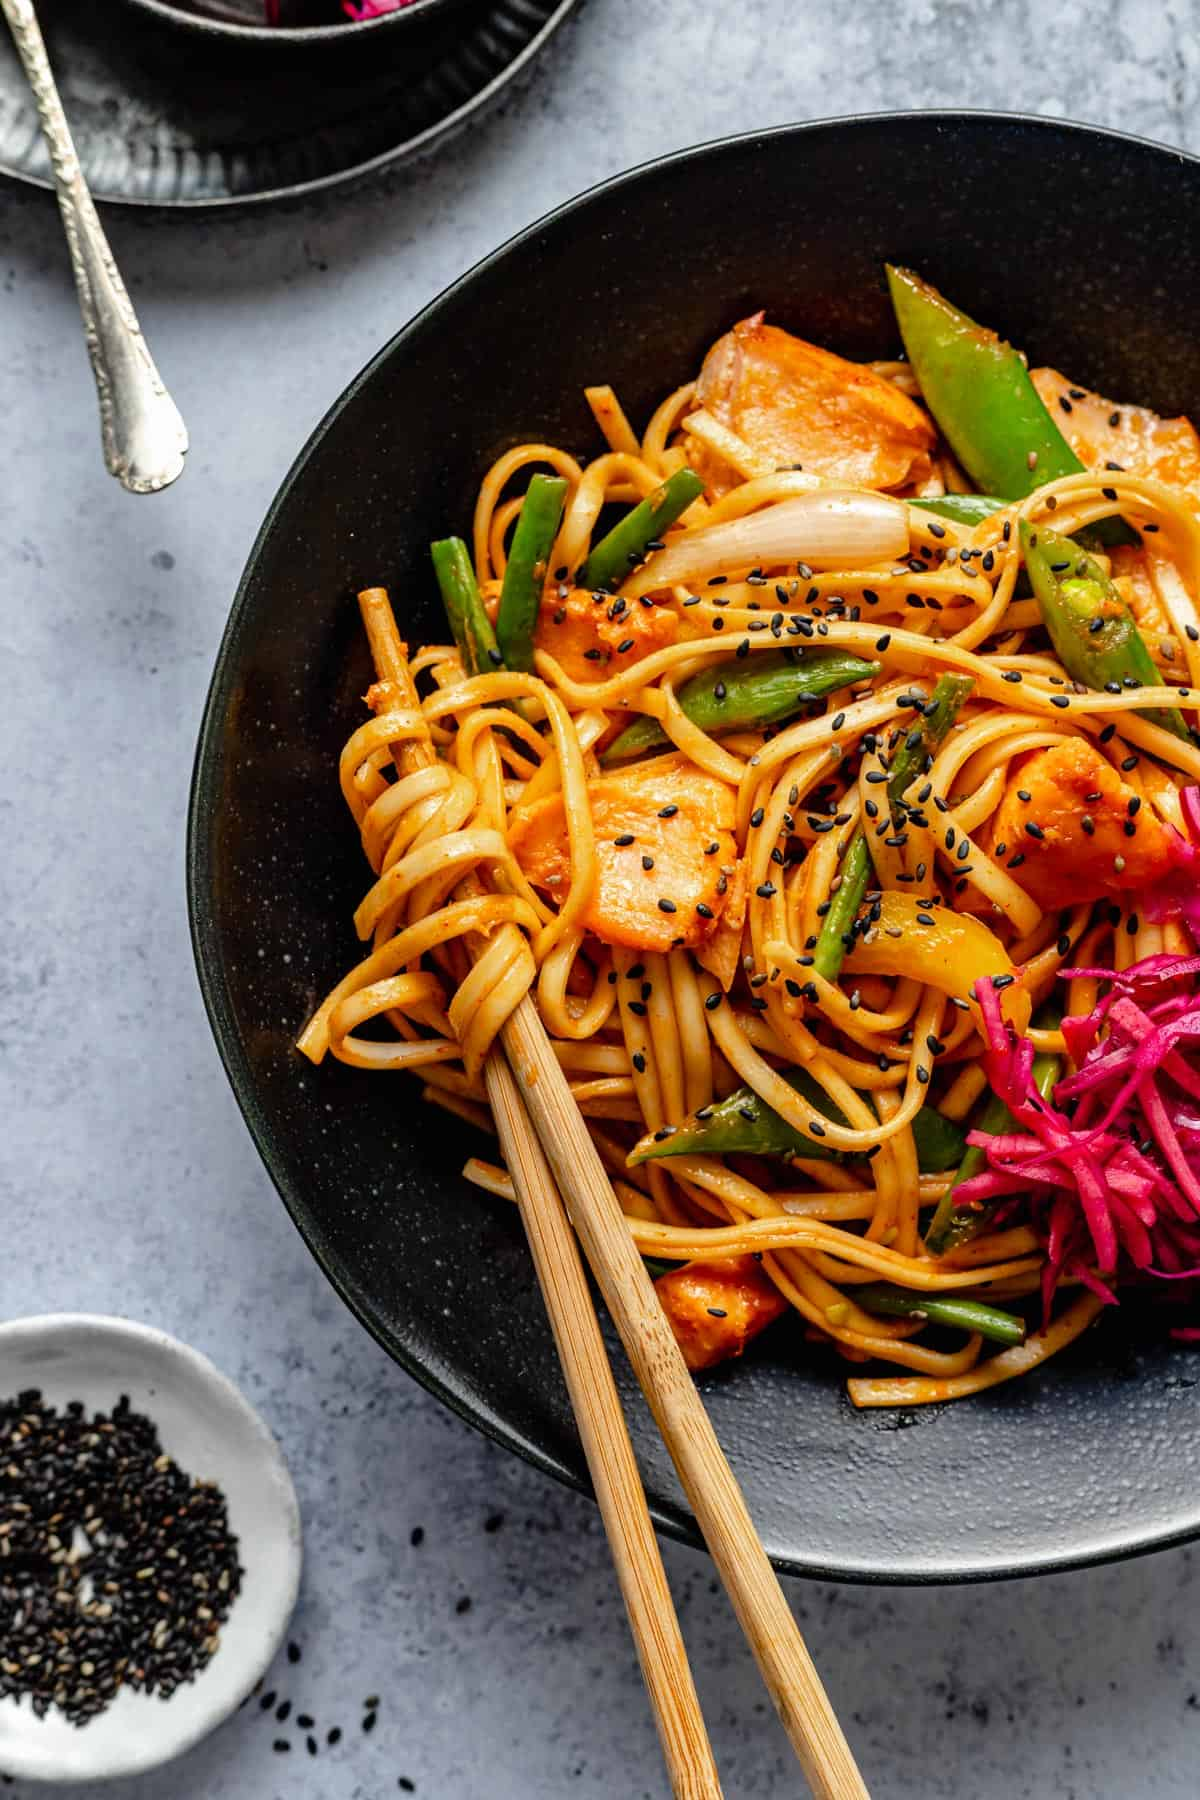 stir fry with chopsticks in a bowl